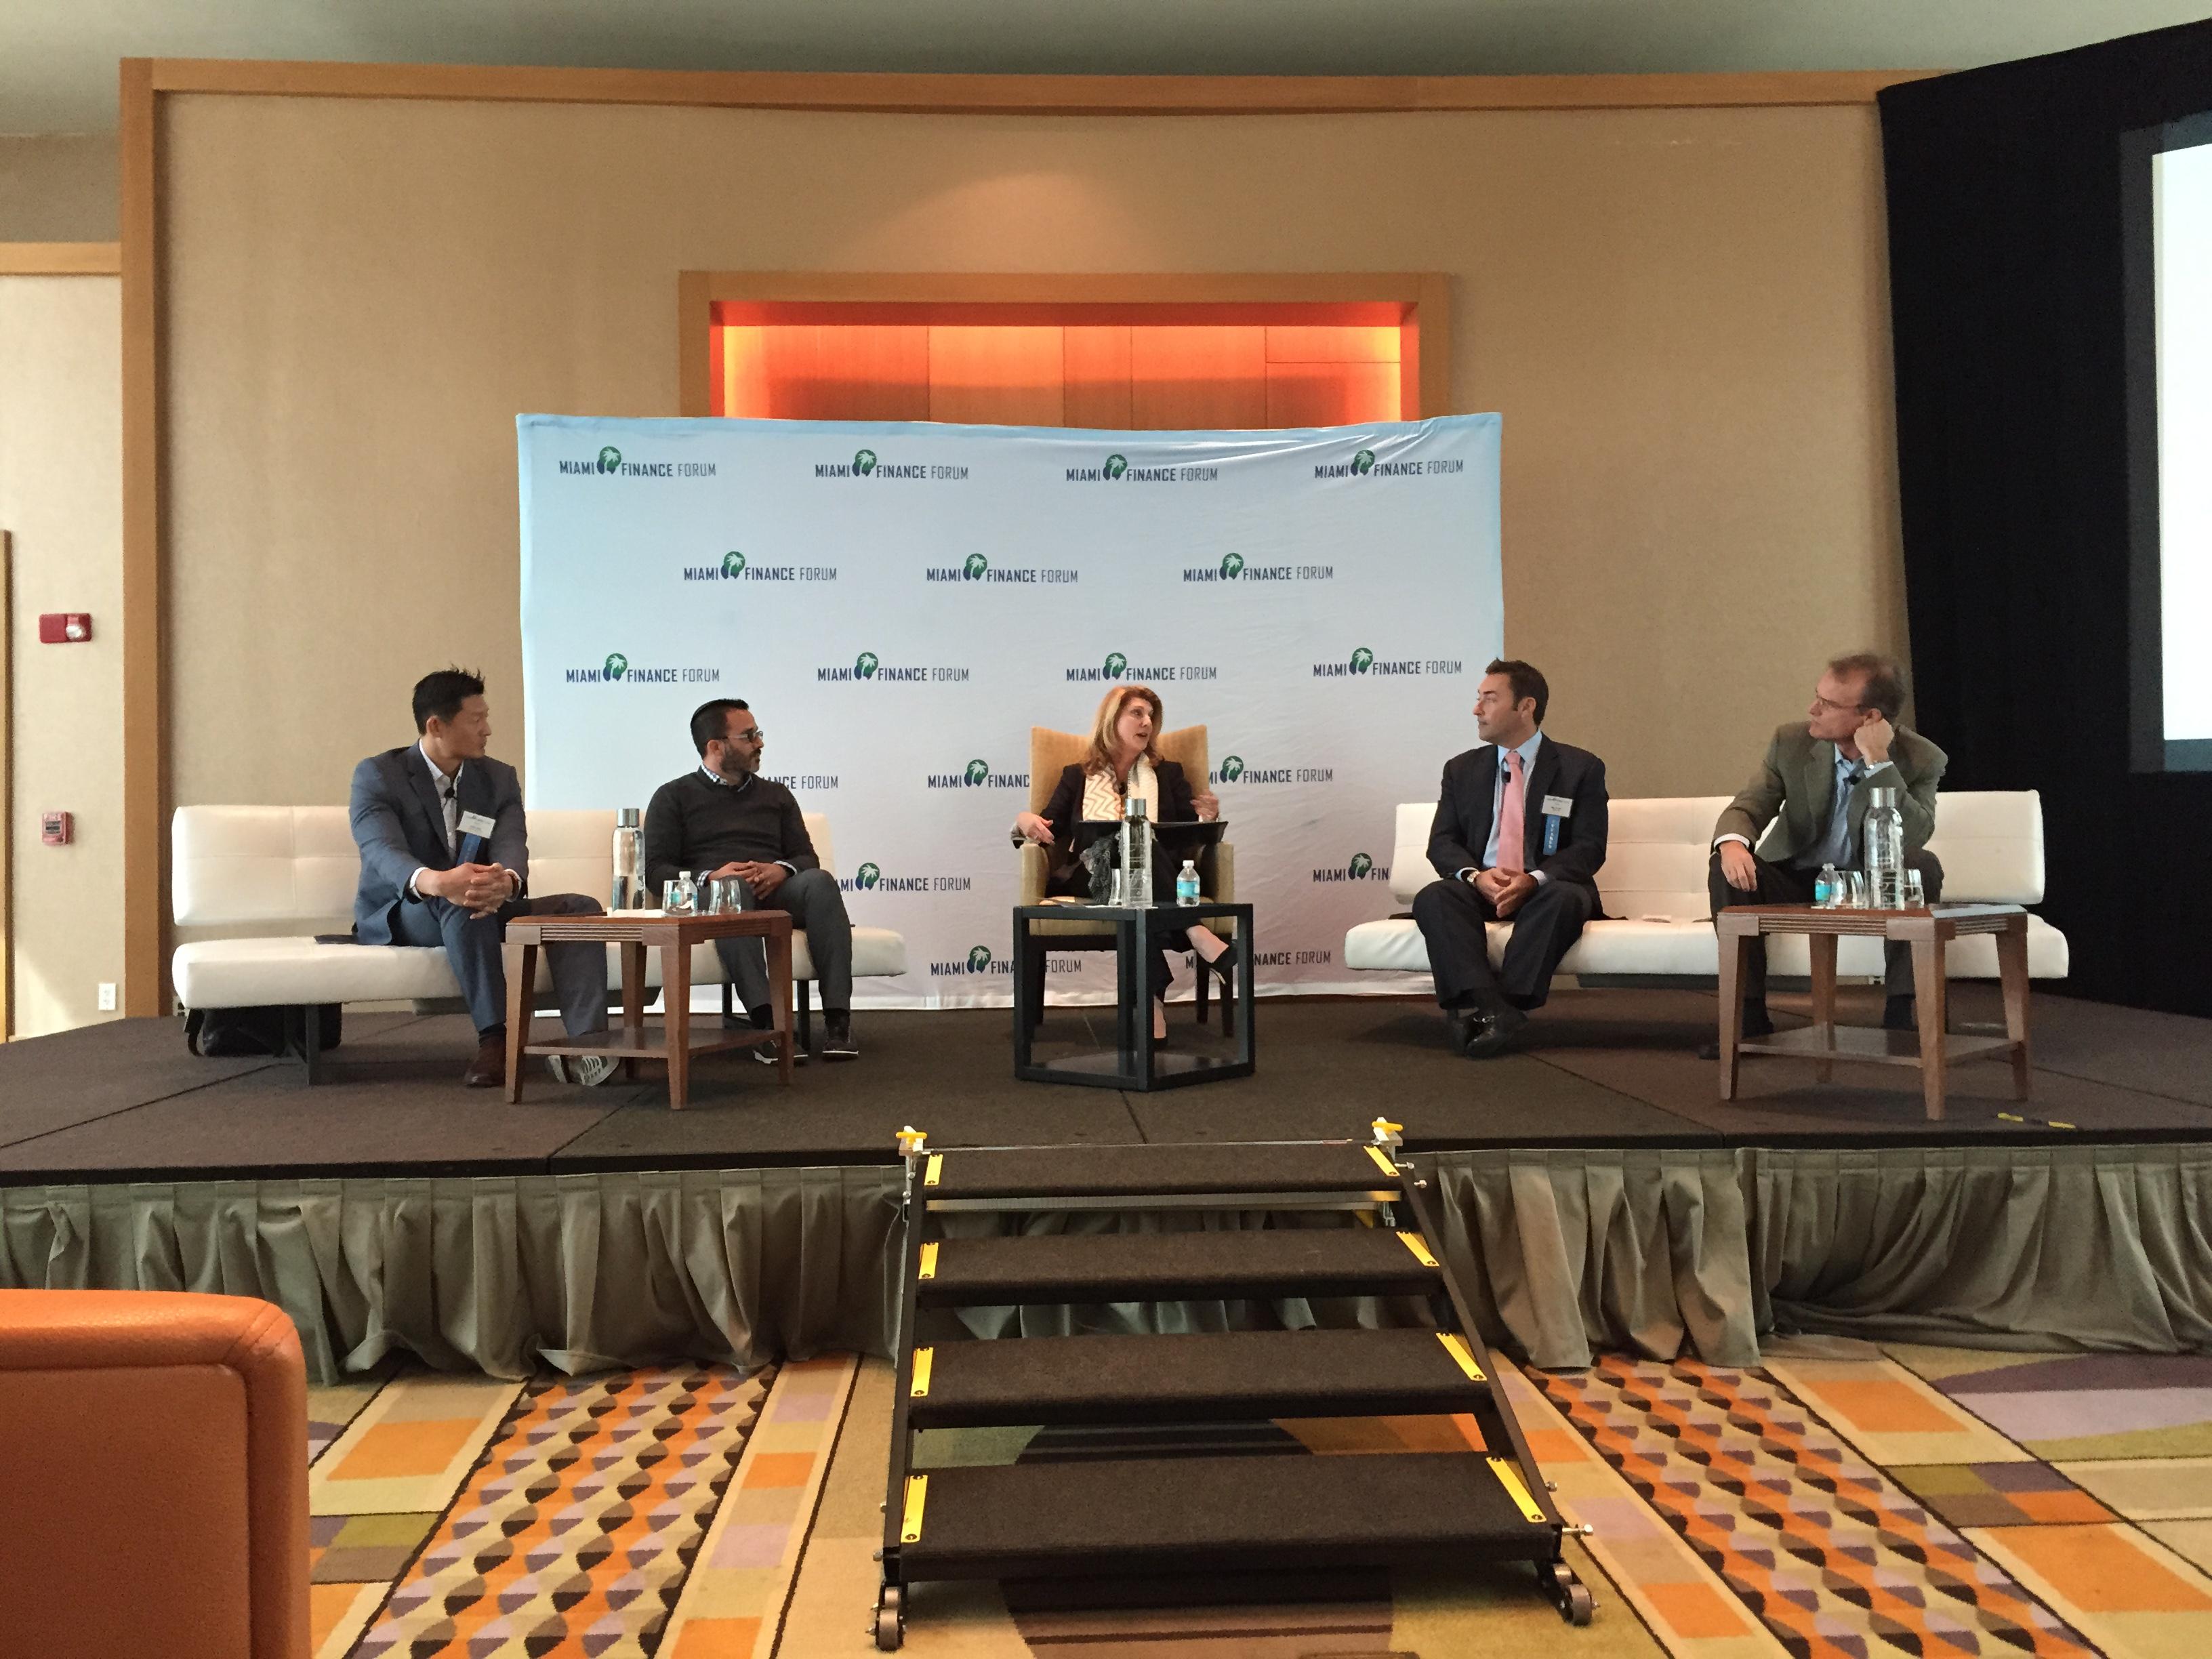 Mapping Miami's Financial Future: Tech, media industries